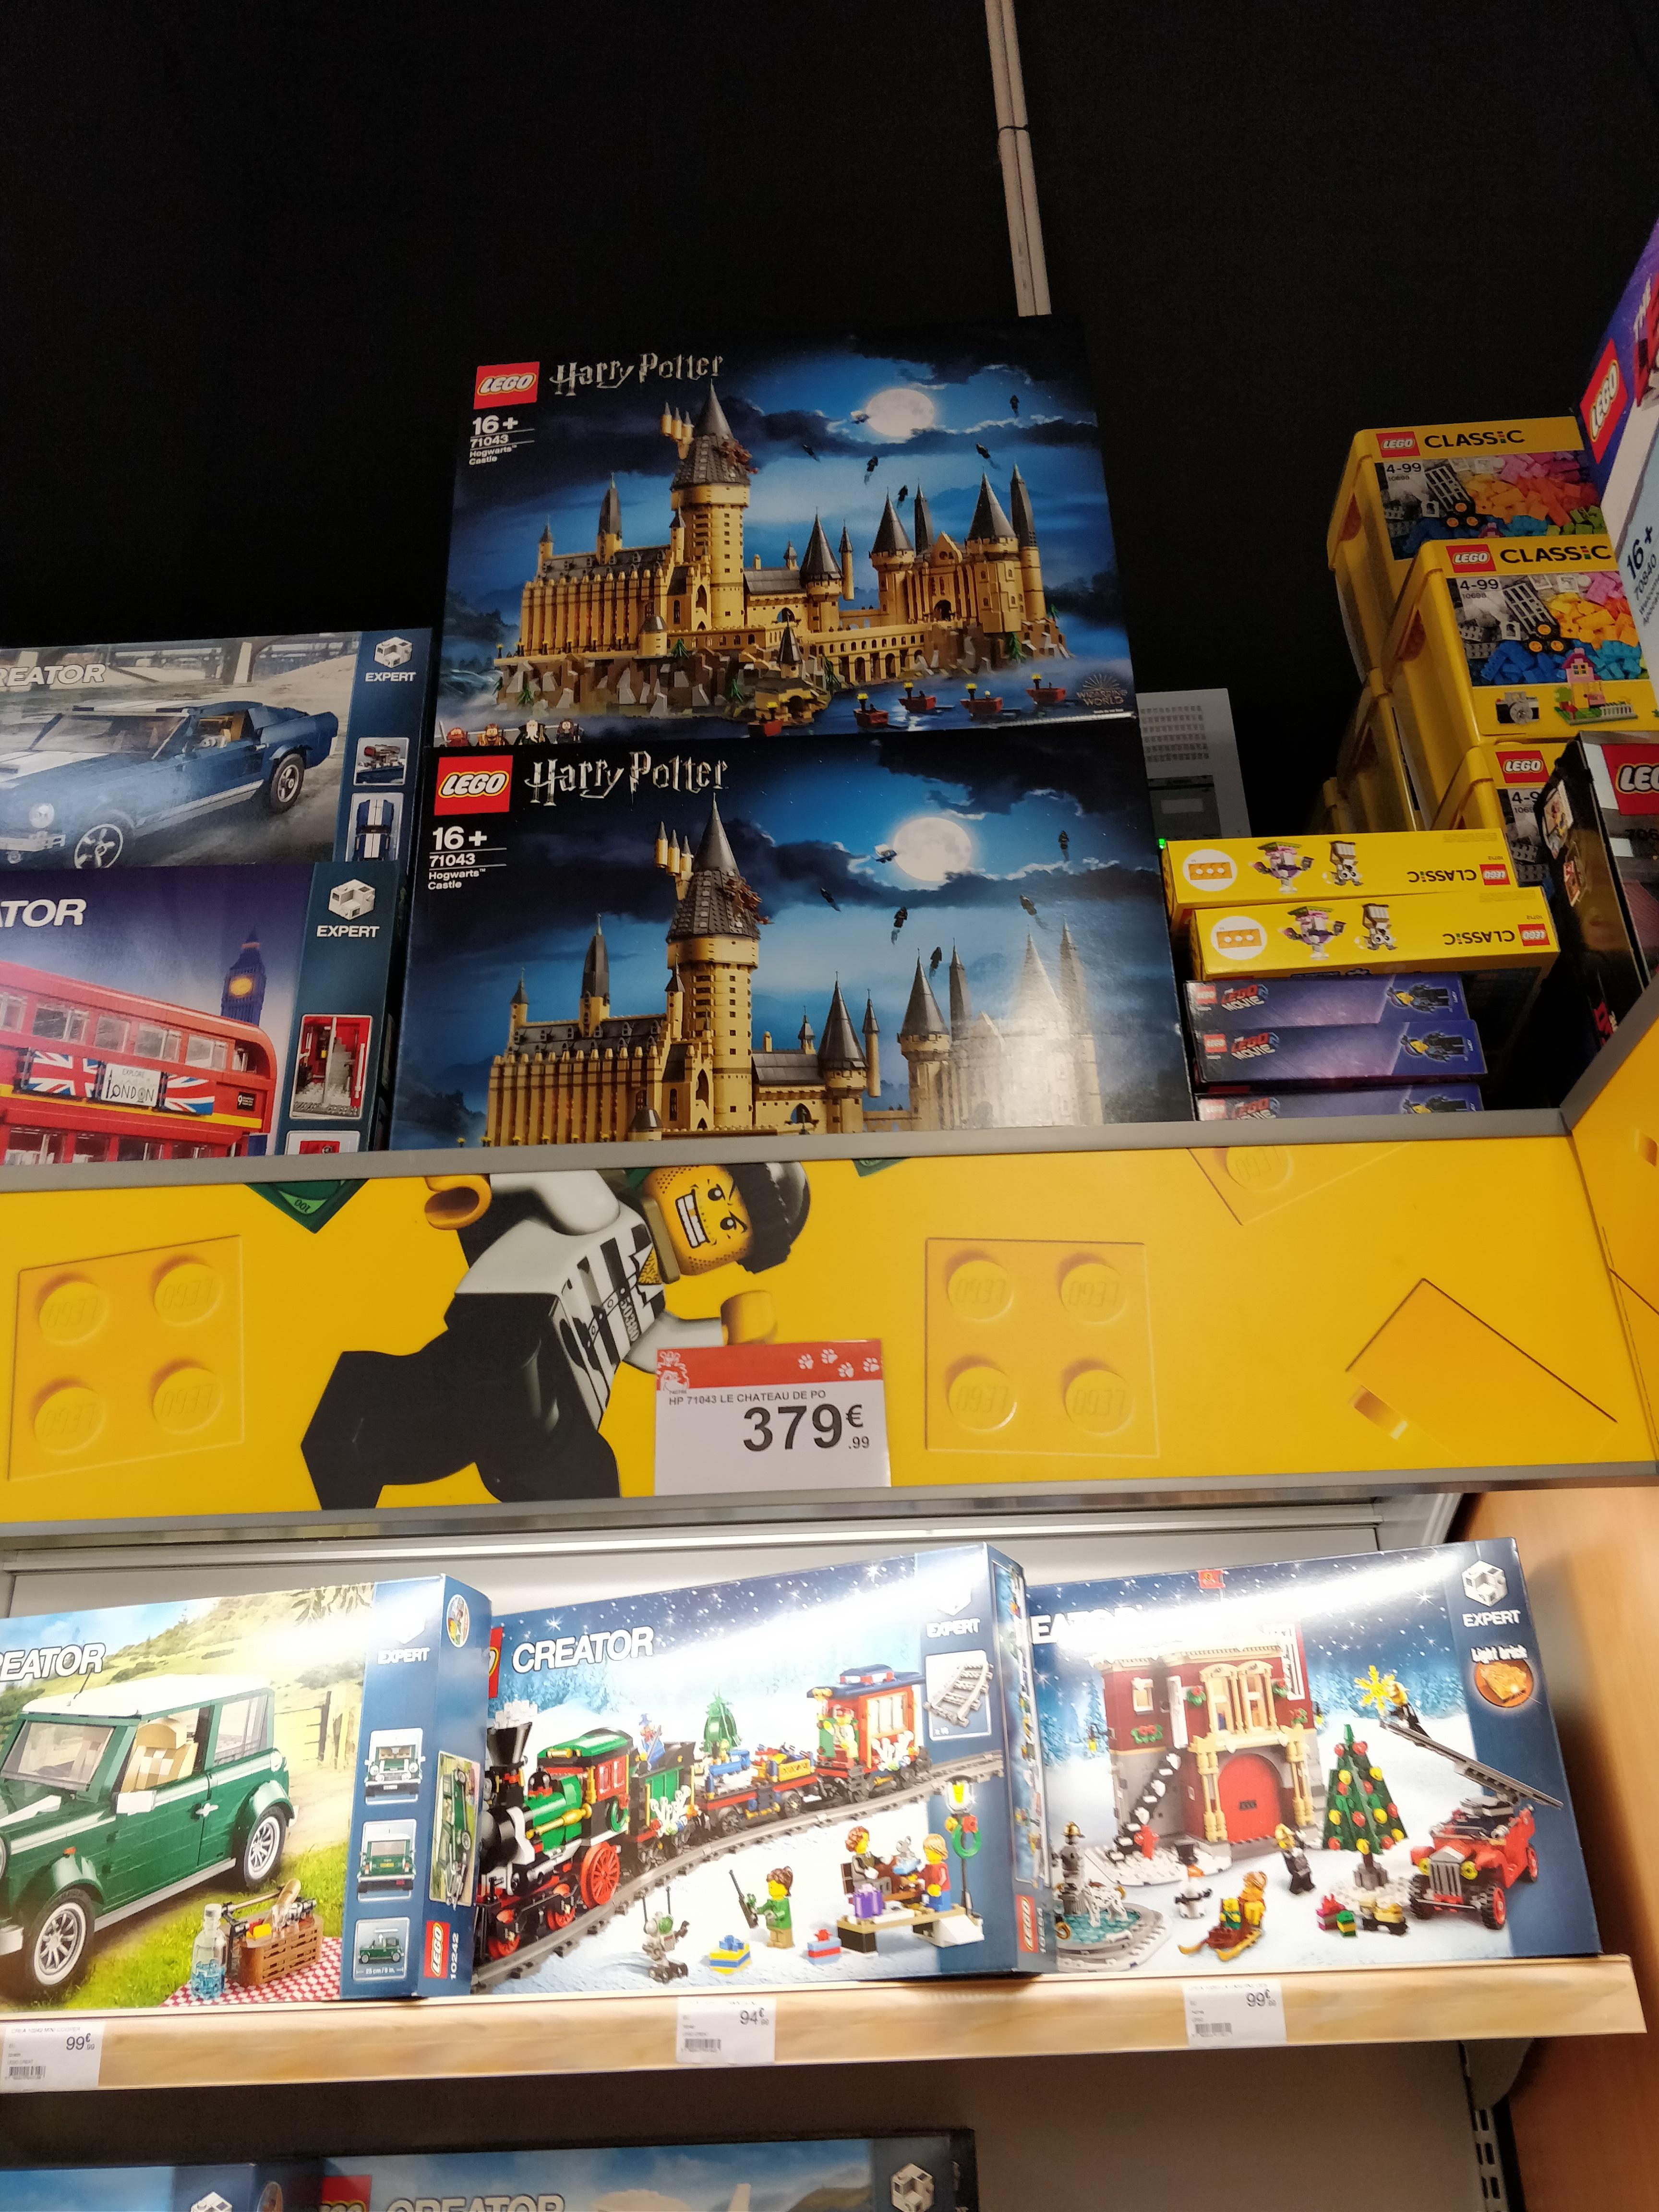 Lego Château Harry Potter - 71043 - Guipavas (29)